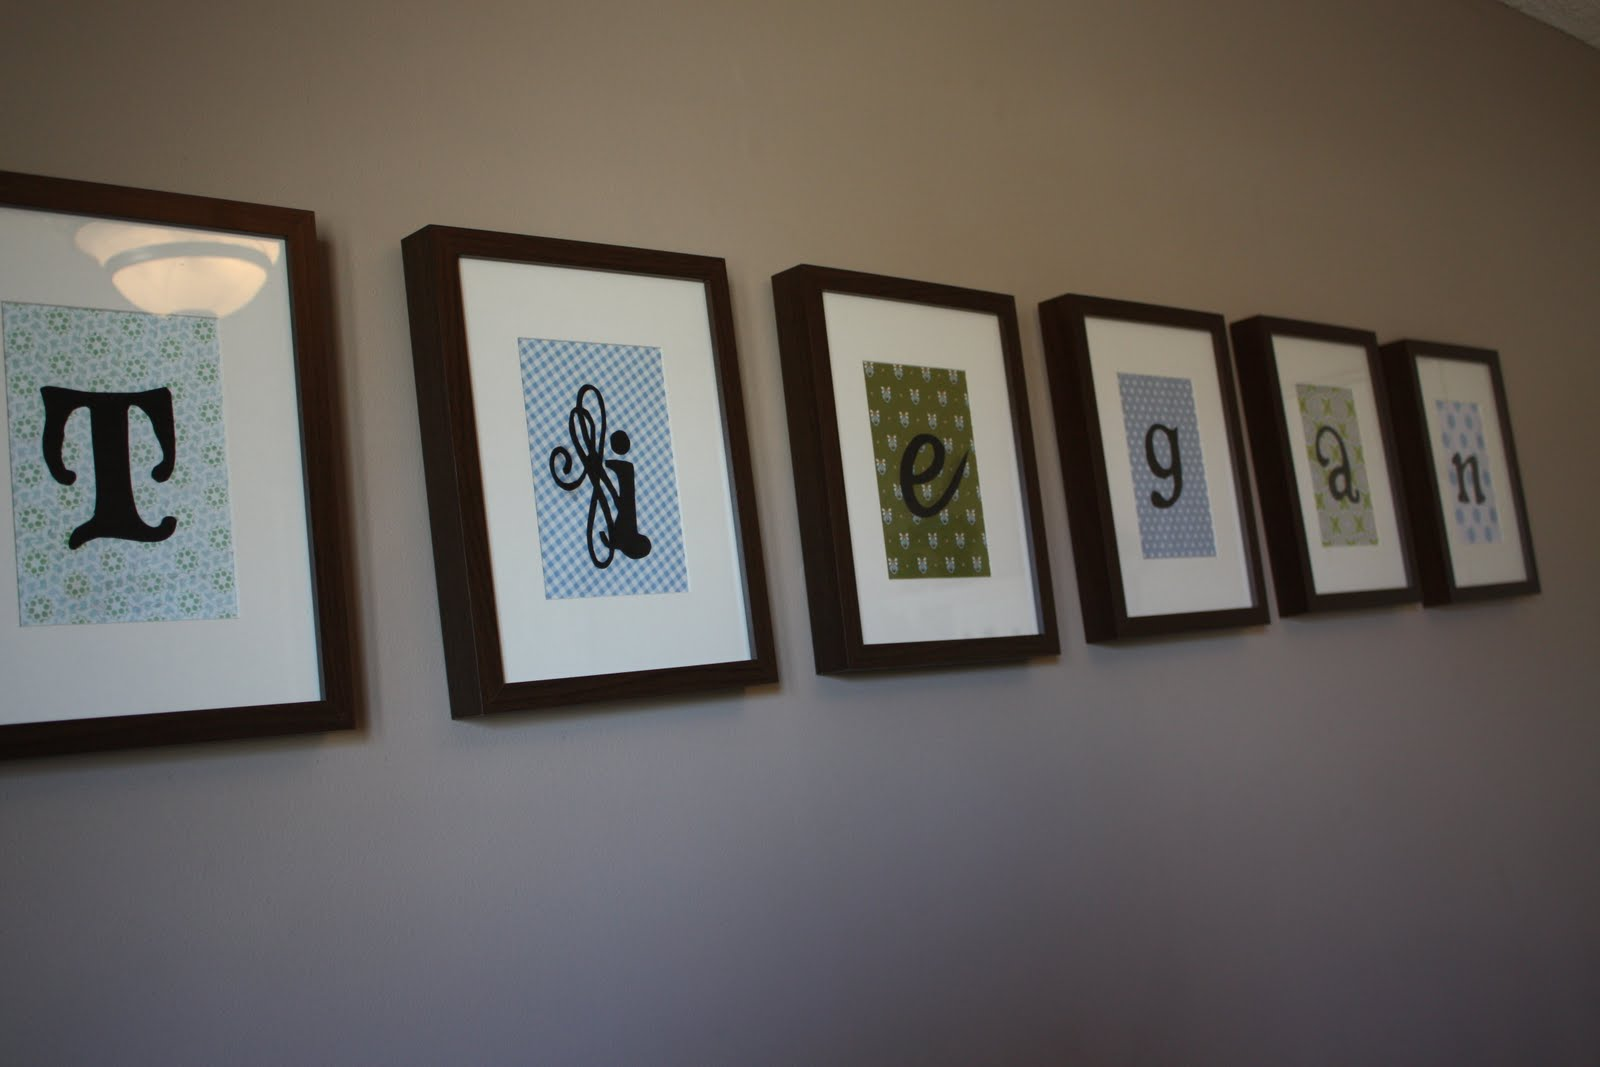 Cheap Wall Art And Decor: Cheap Personalized Wall Decor